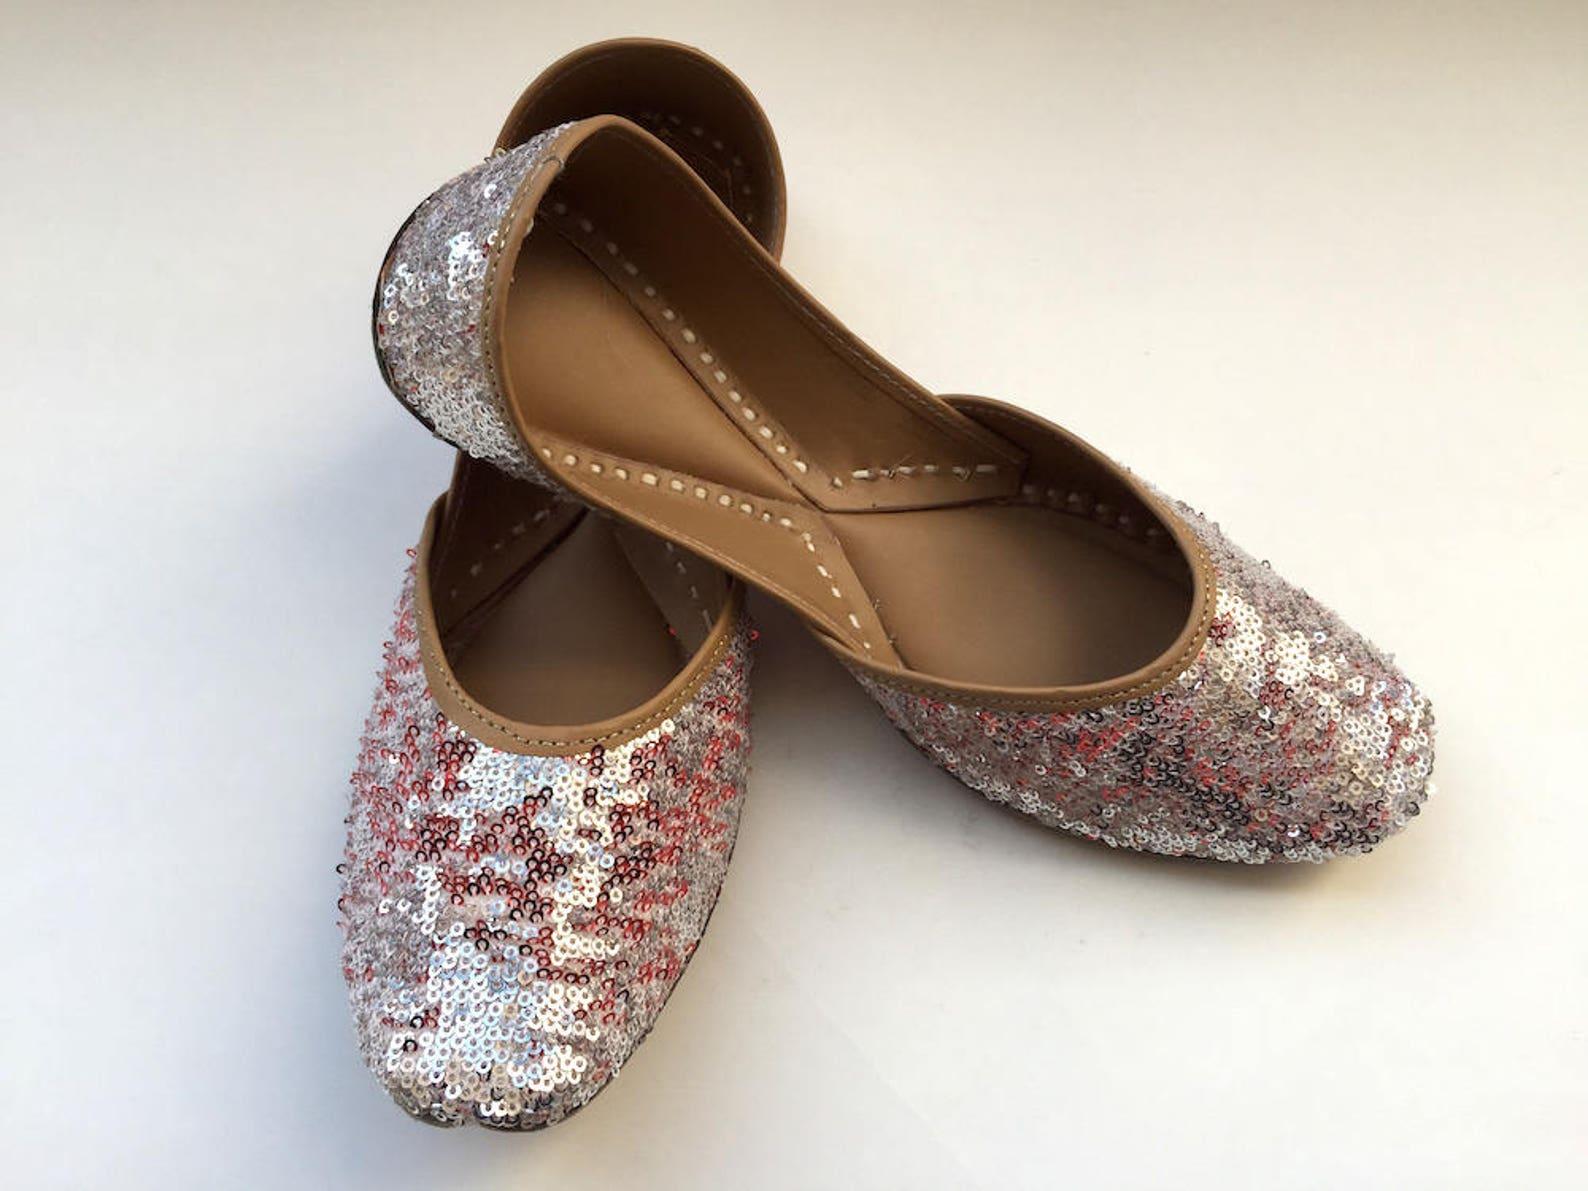 women silver sequins ballet flats, red sequins shoes from enhara, wedding shoes, women shoes, bridal ballet flats, sequins glitt